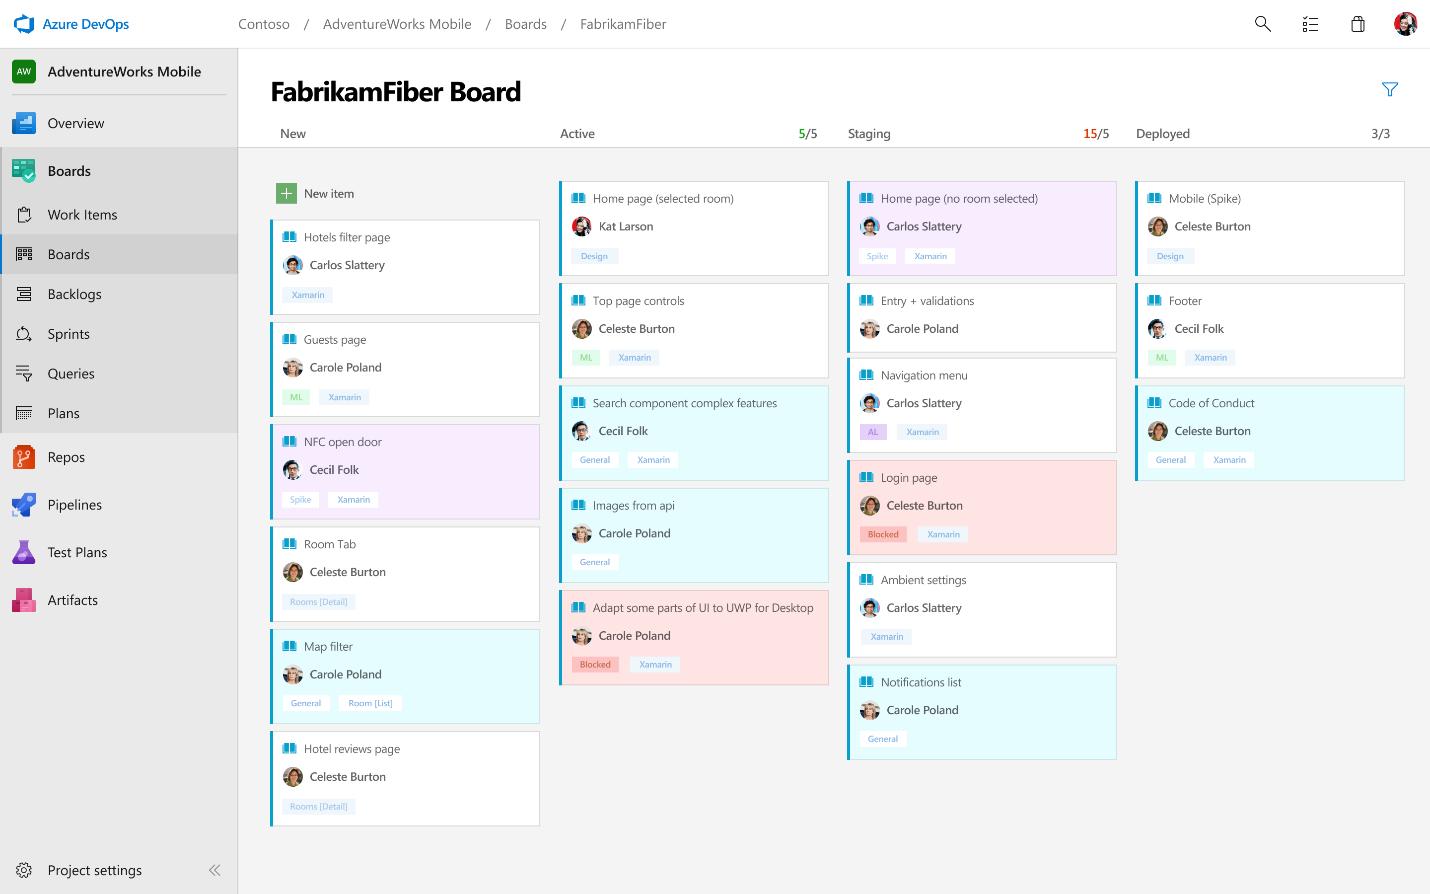 Microsoft Rebranding Leads to Cloud Native Azure DevOps